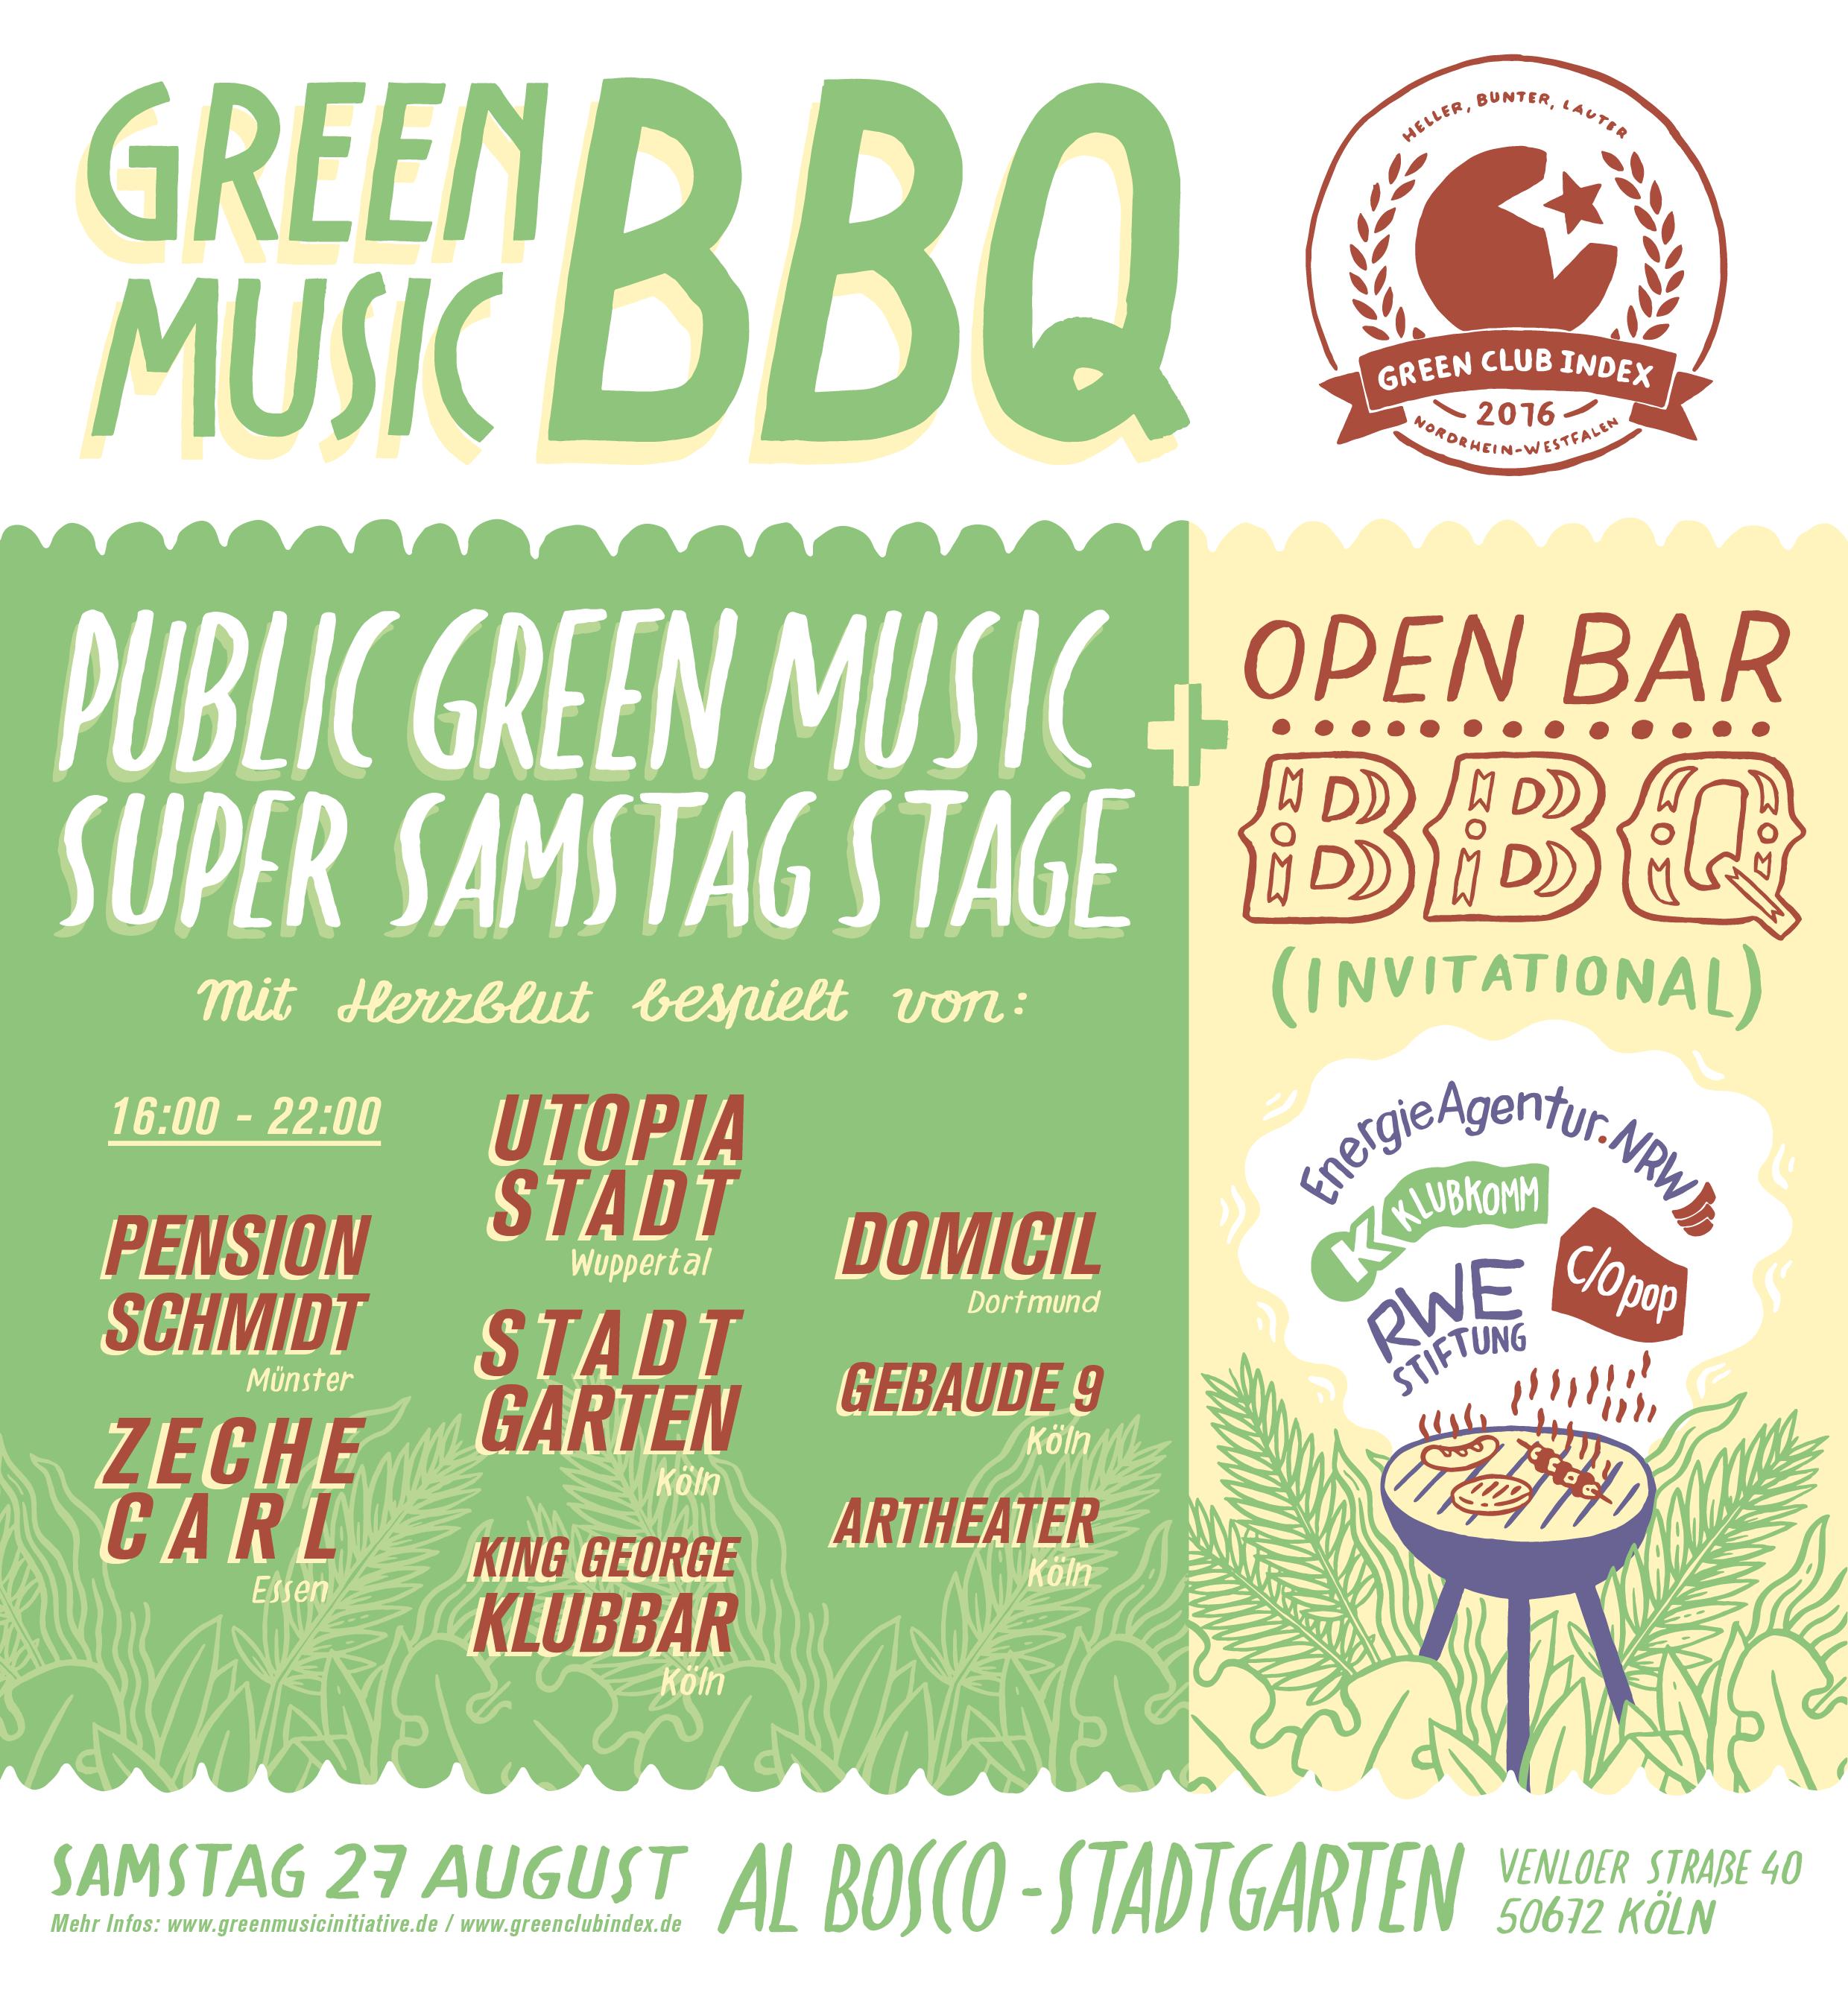 Green Music BBQ 2016